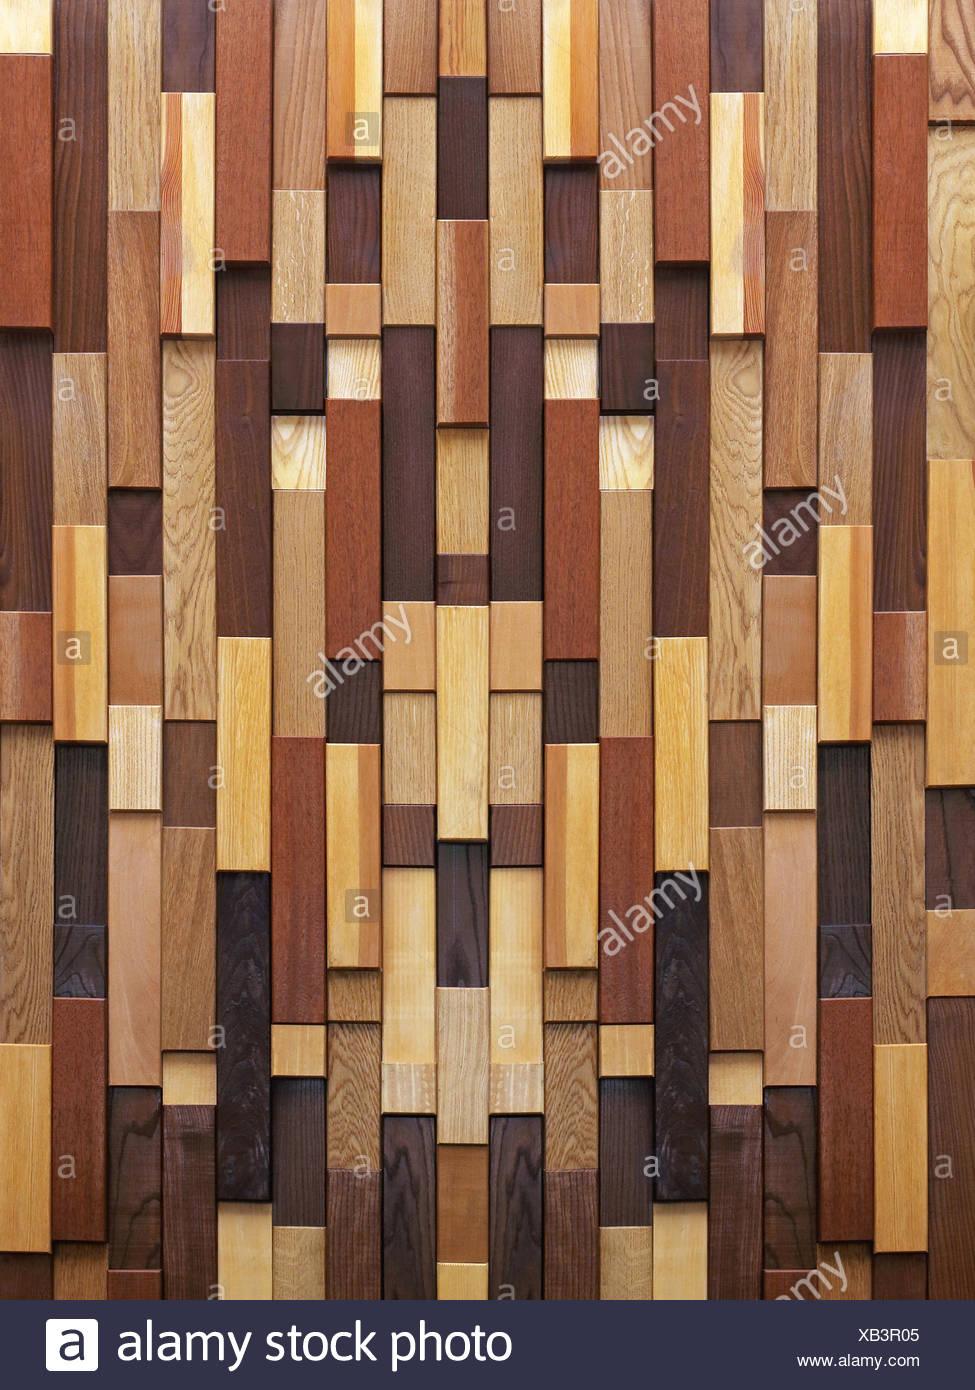 Fliesen Holzoptik Stockfoto Bild Alamy - Fliesen holzoptik lärche